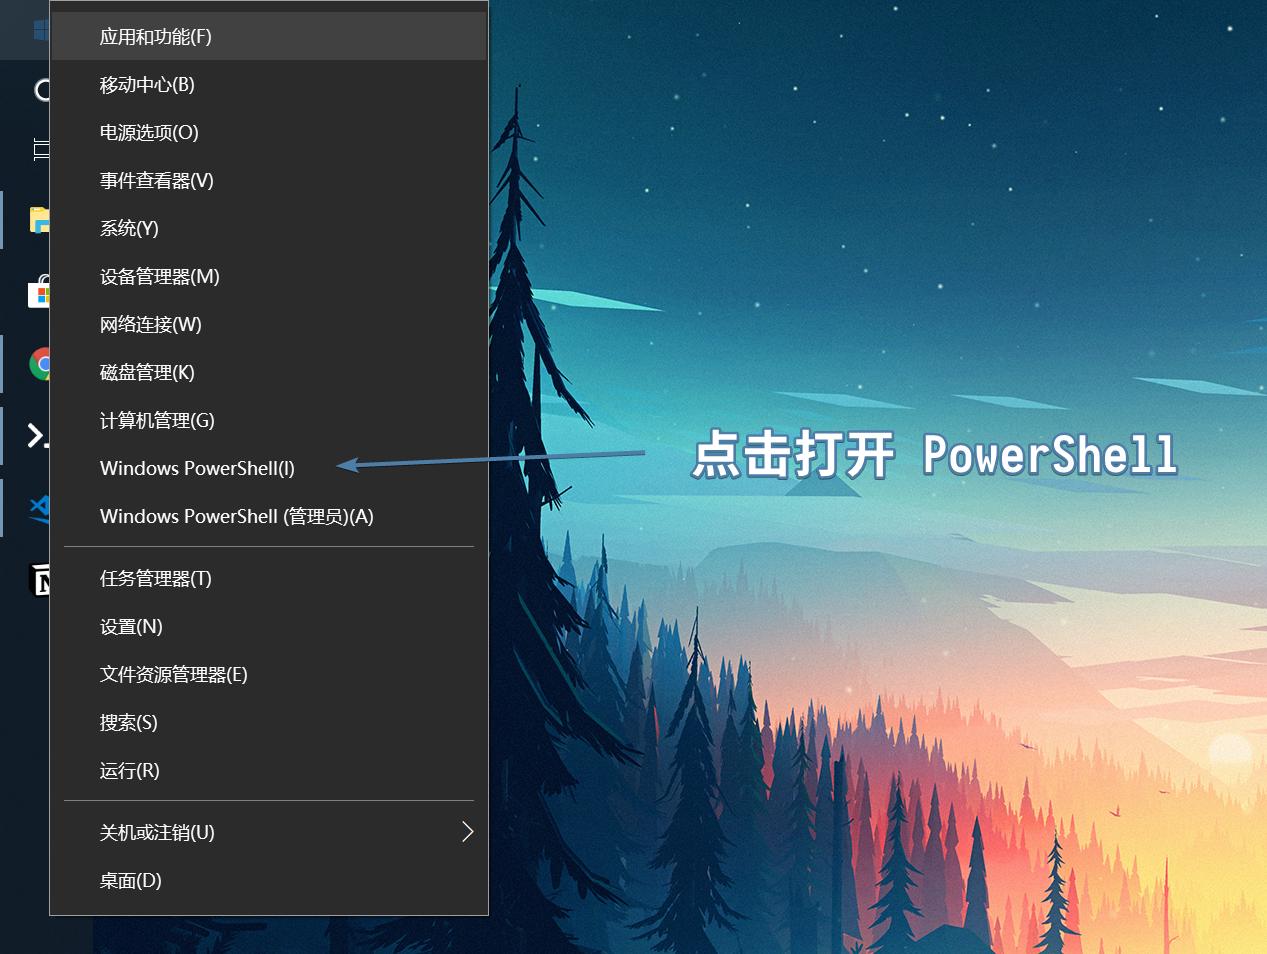 打开 PowerShell